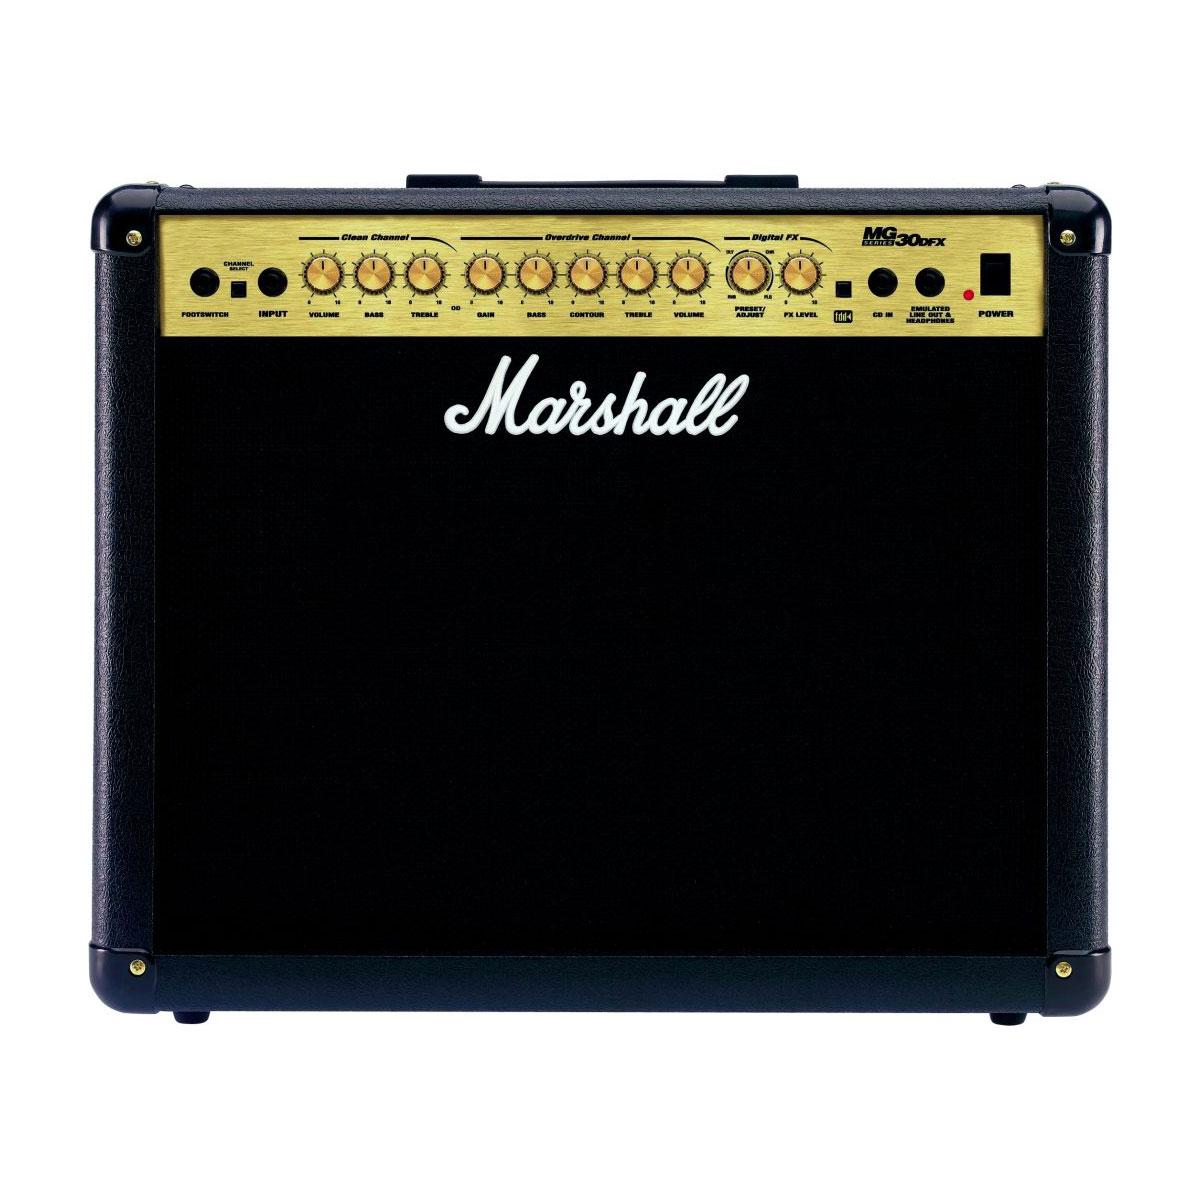 Marshall MG30DFX Gitarrenamp Gitarrenverstärker • CONCERT ...